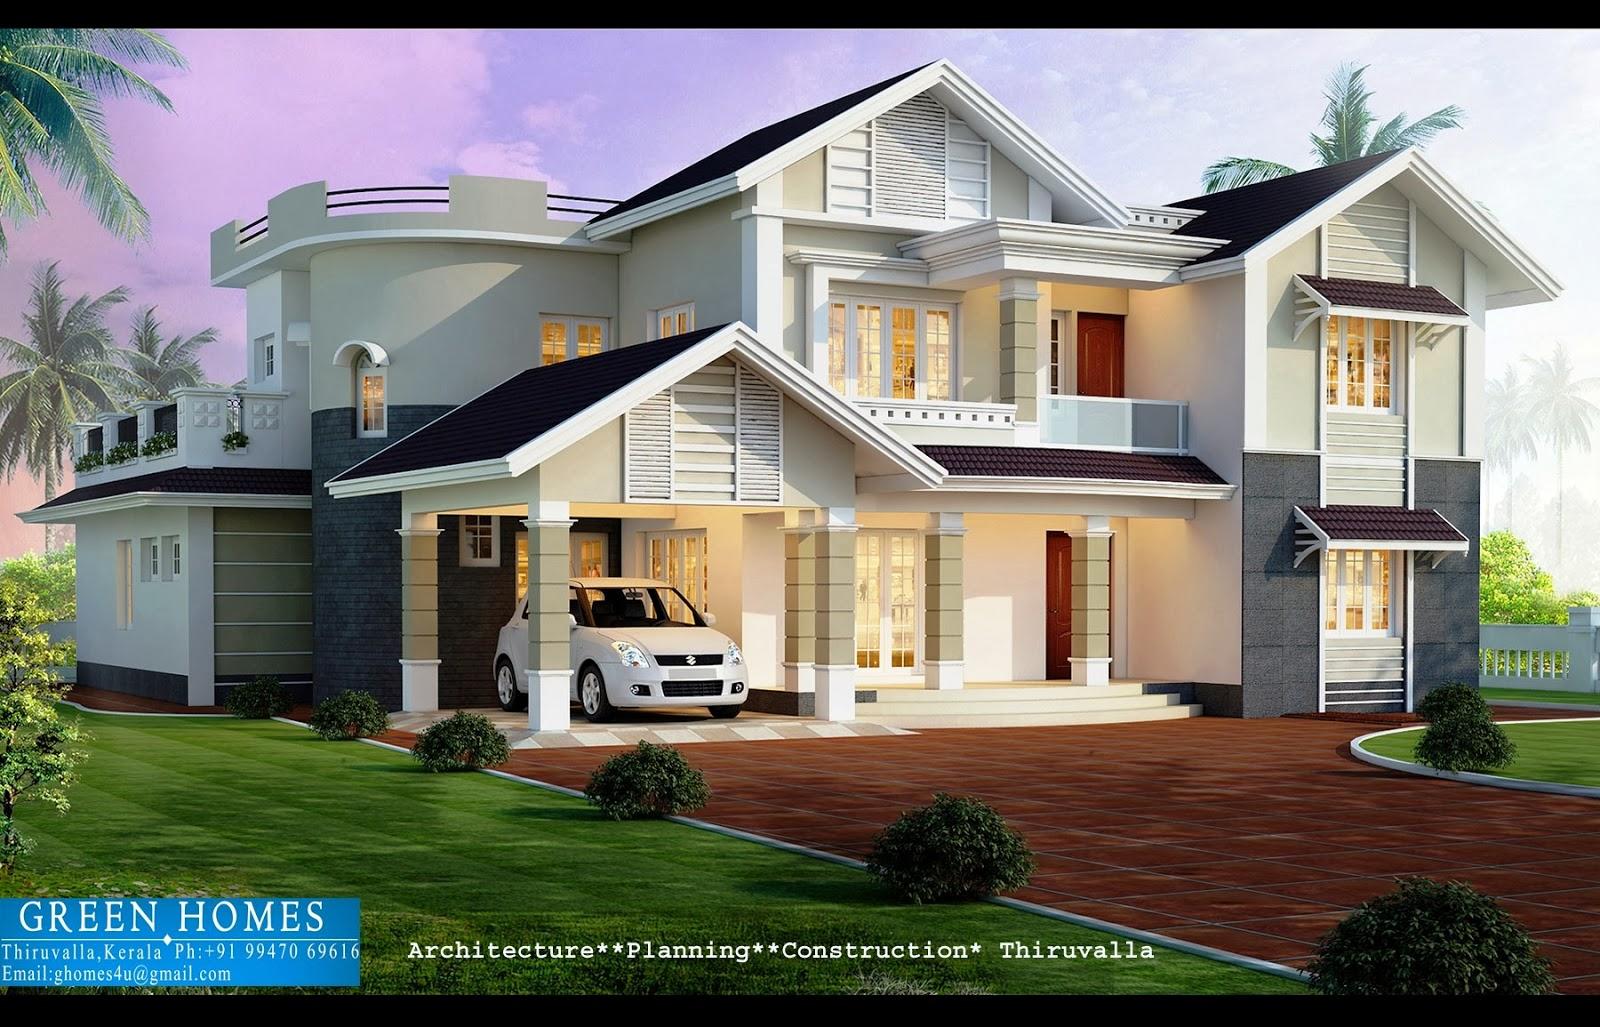 Green Homes Beautiful Home Design